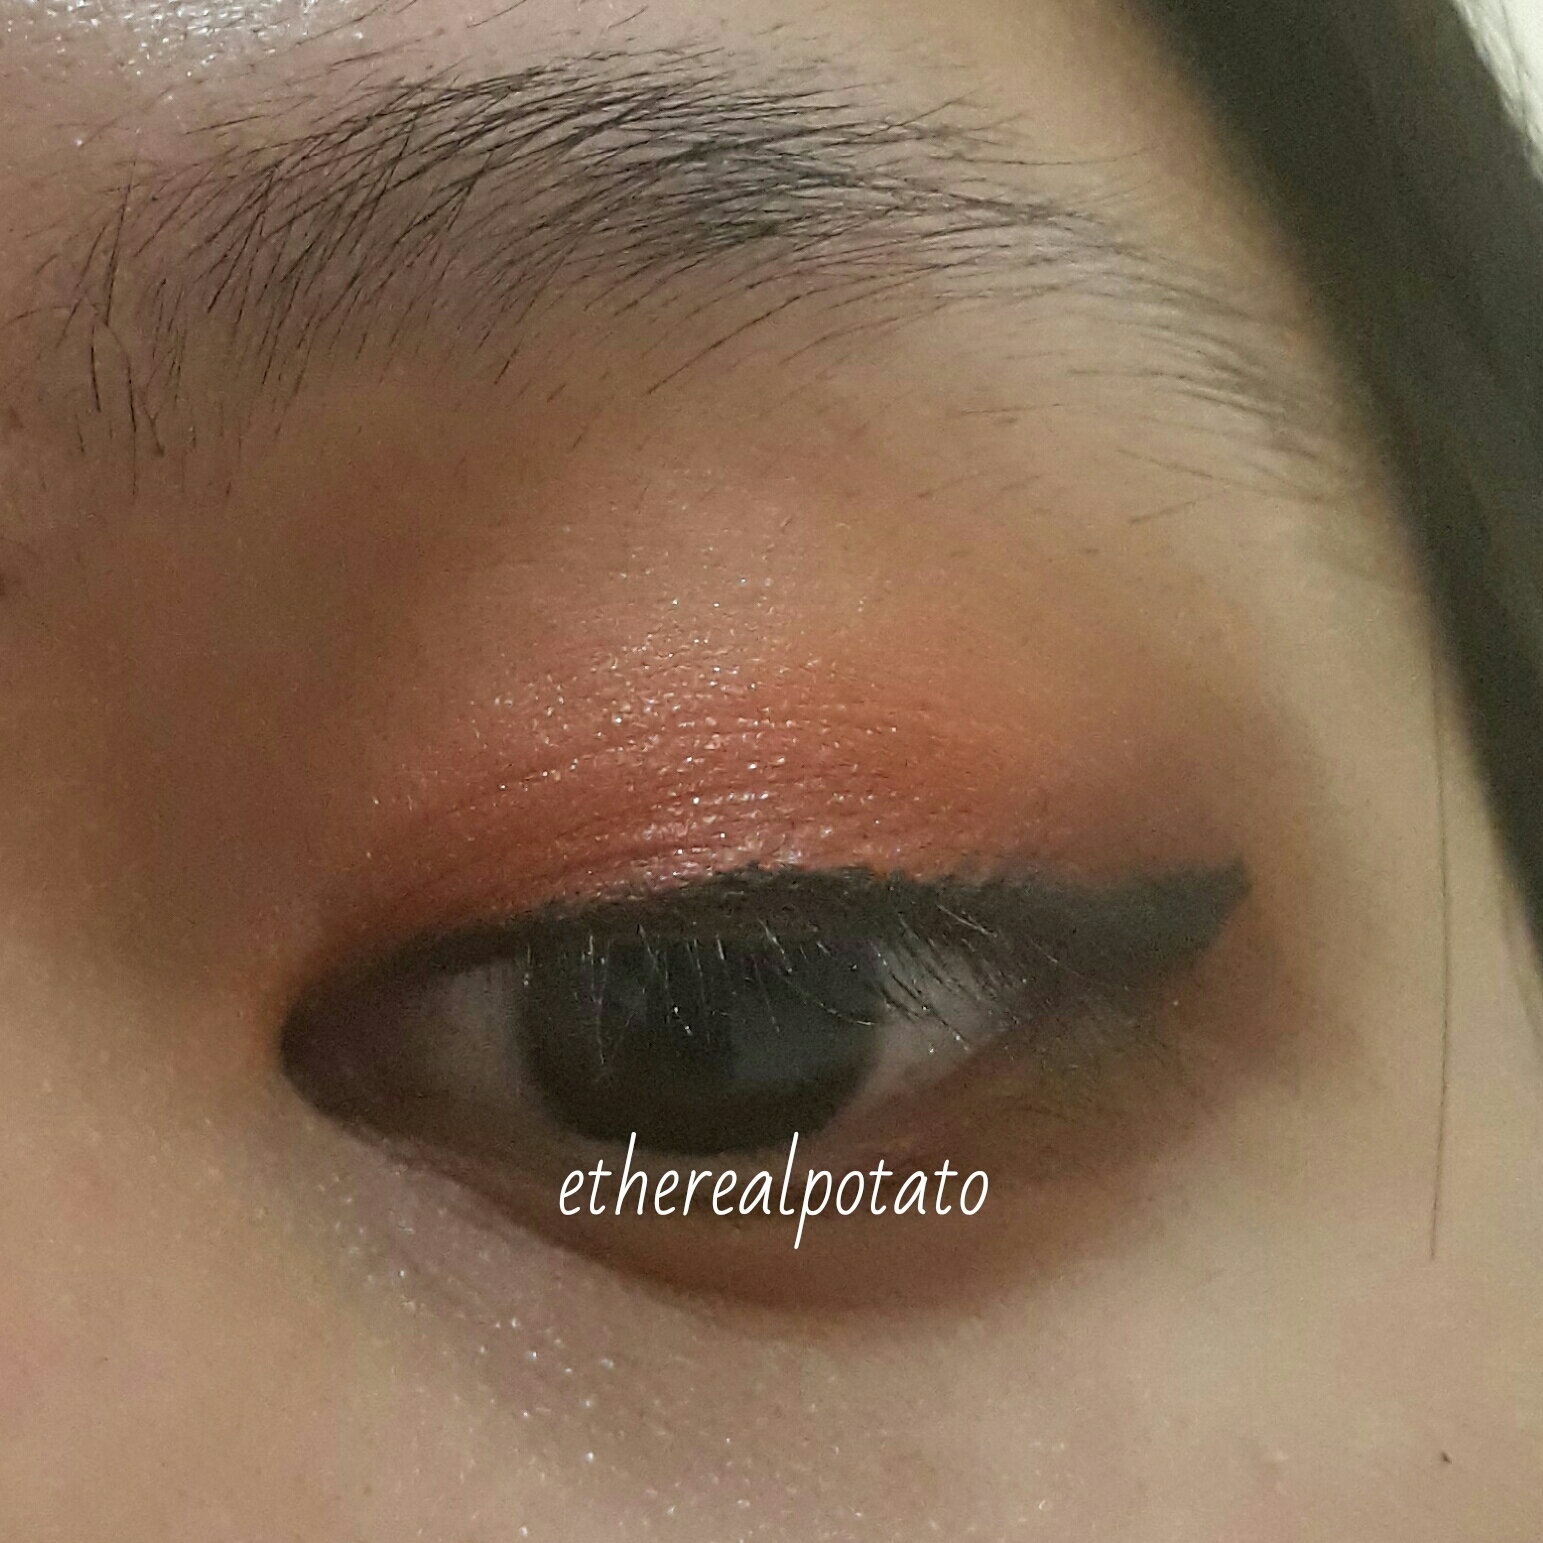 Nah foto diatas ini foto pemakaian Focallure 9 Color Eyeshadow Palette 5 di eyelid aku tanpa menggunakan eyeshadow base sama sekali